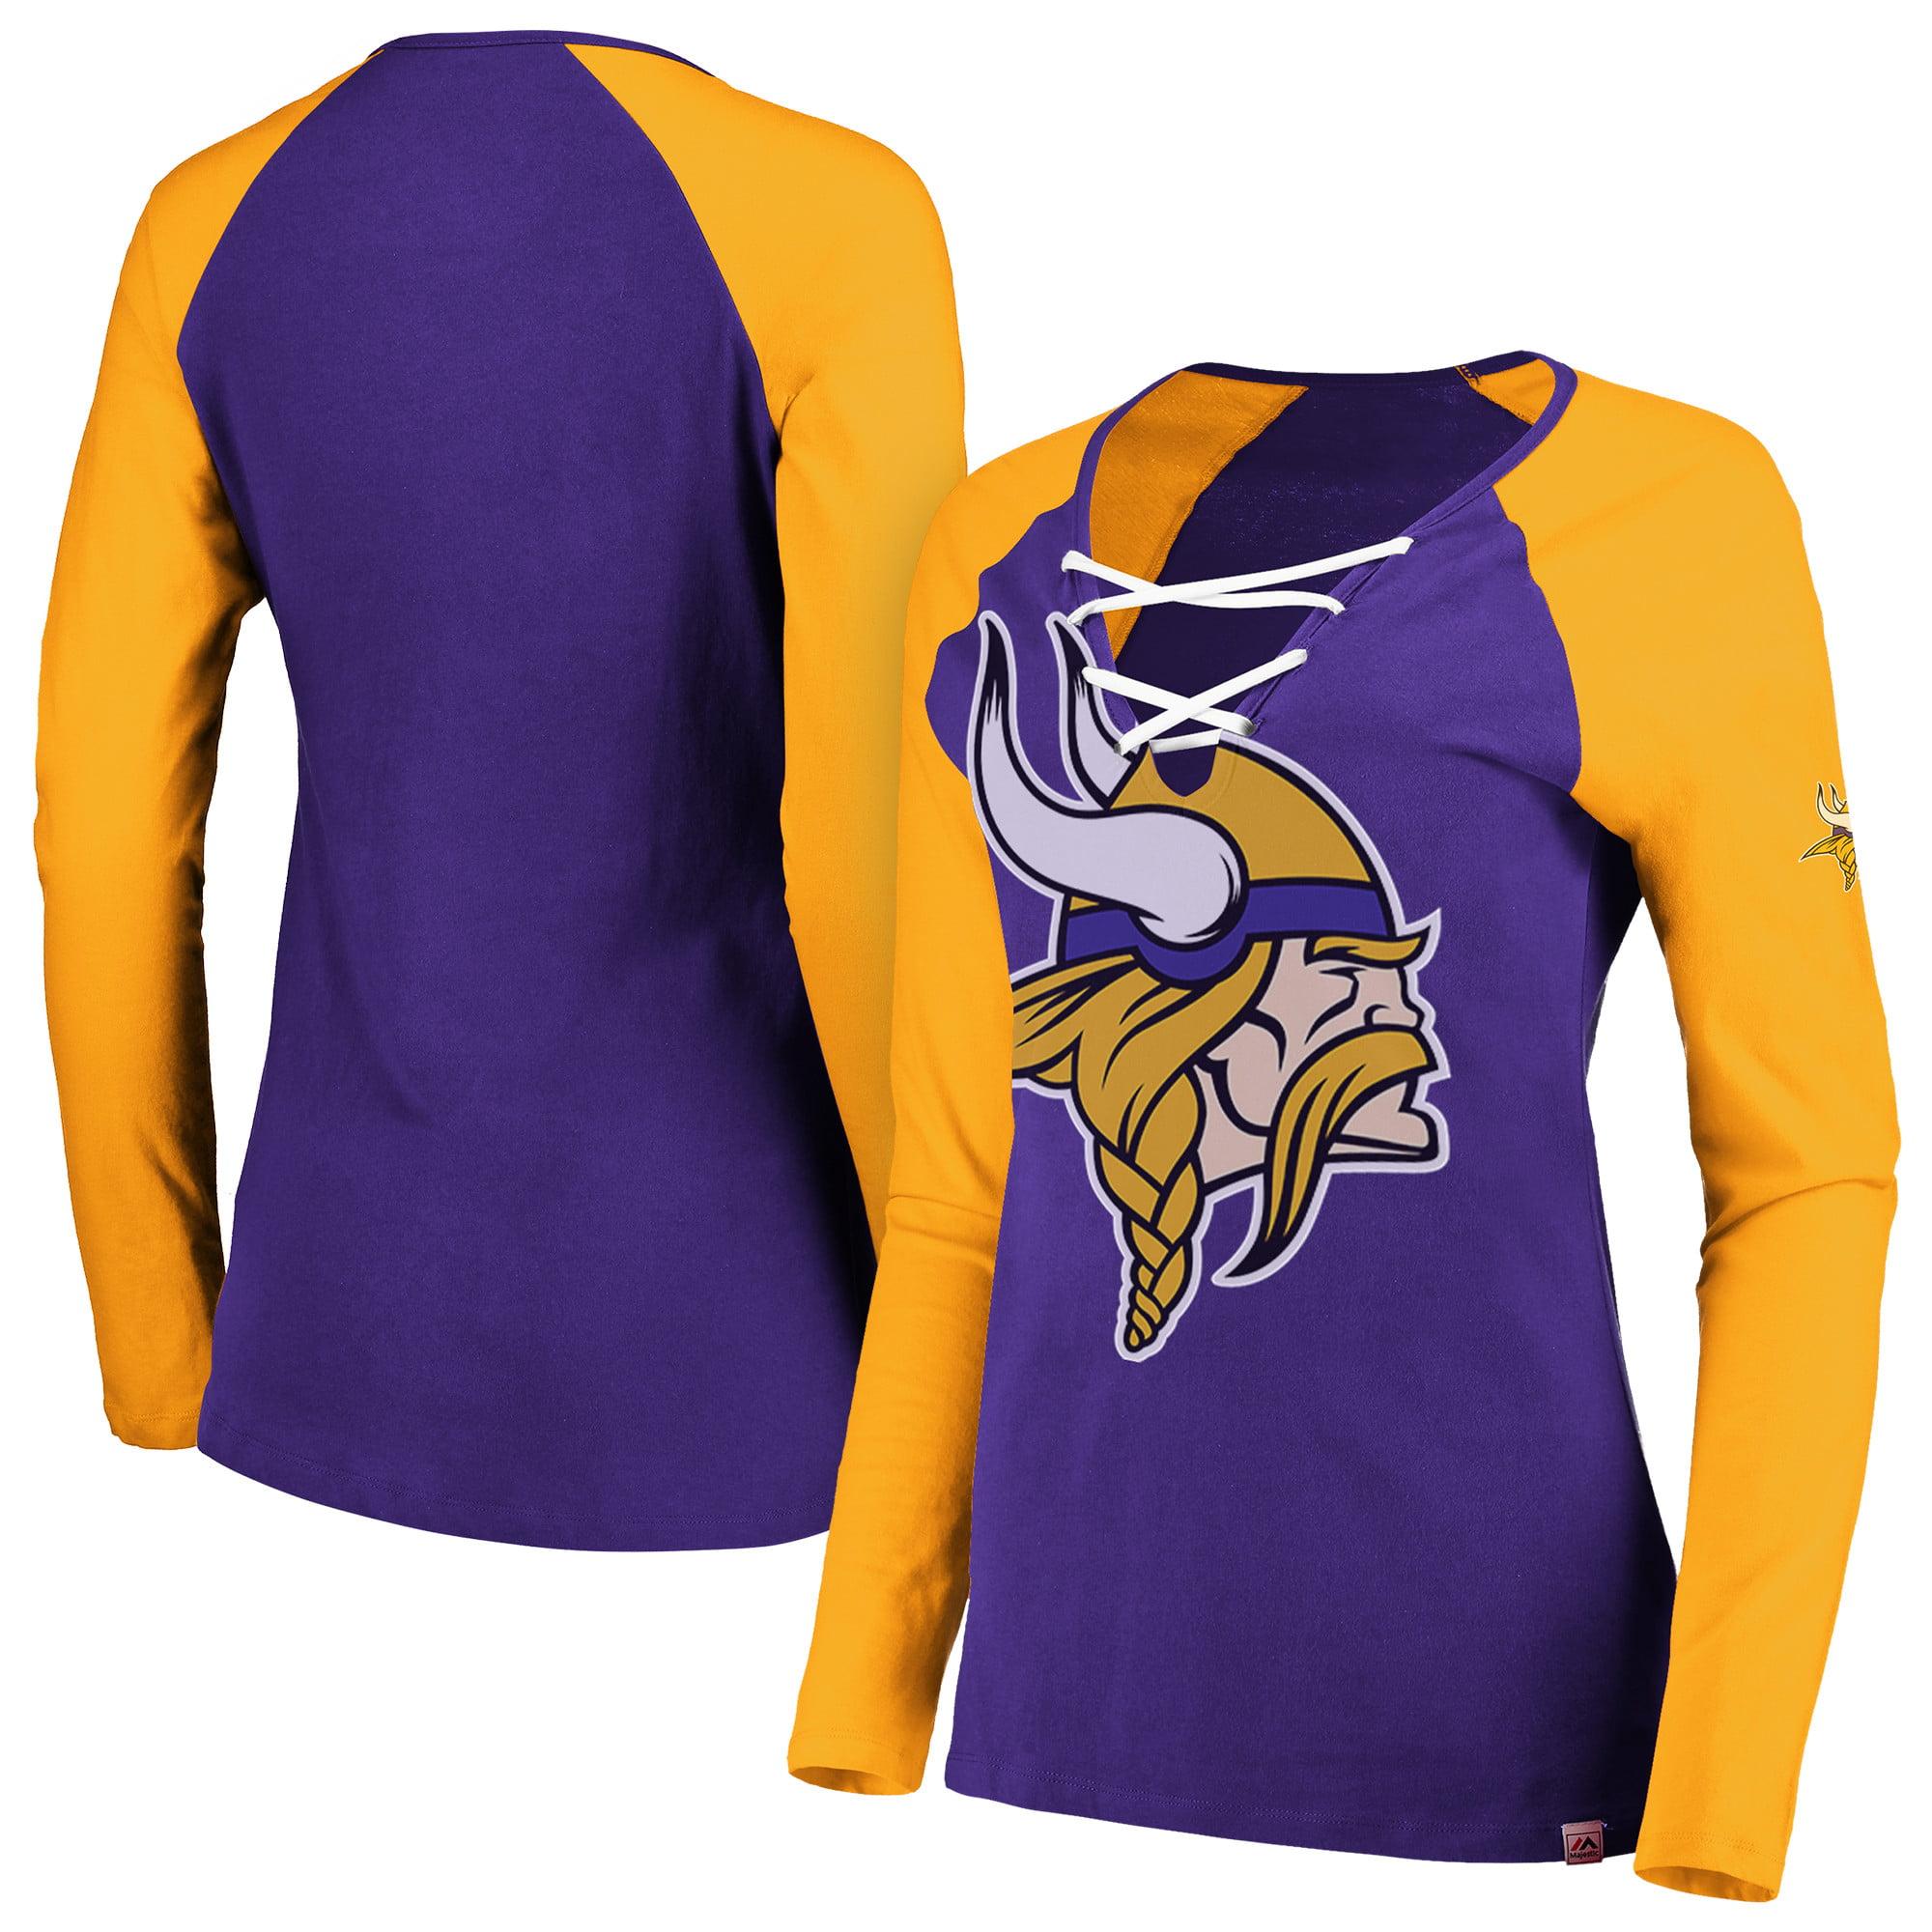 Minnesota Vikings Majestic Women's Long Sleeve Lace-Up V-Neck T-Shirt - Purple/Gold